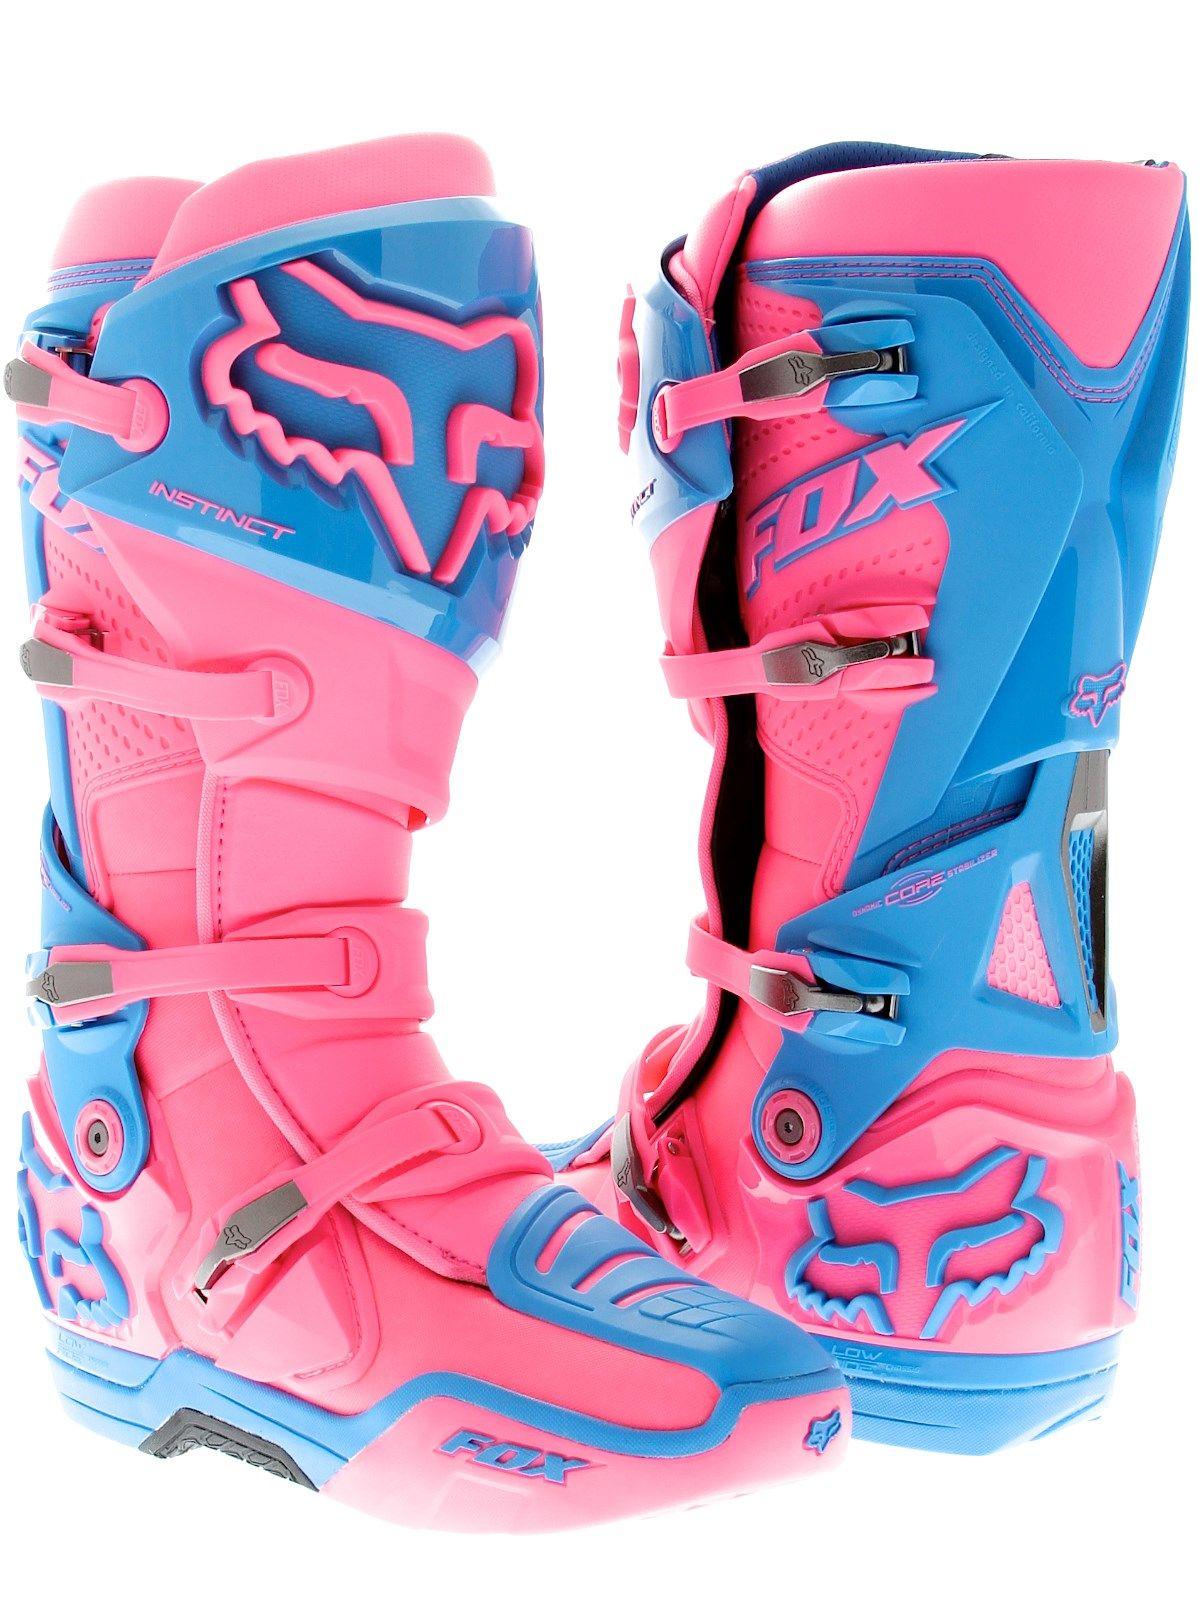 Fox Pink Image Atlanta Supercross Limited Edition Instinct